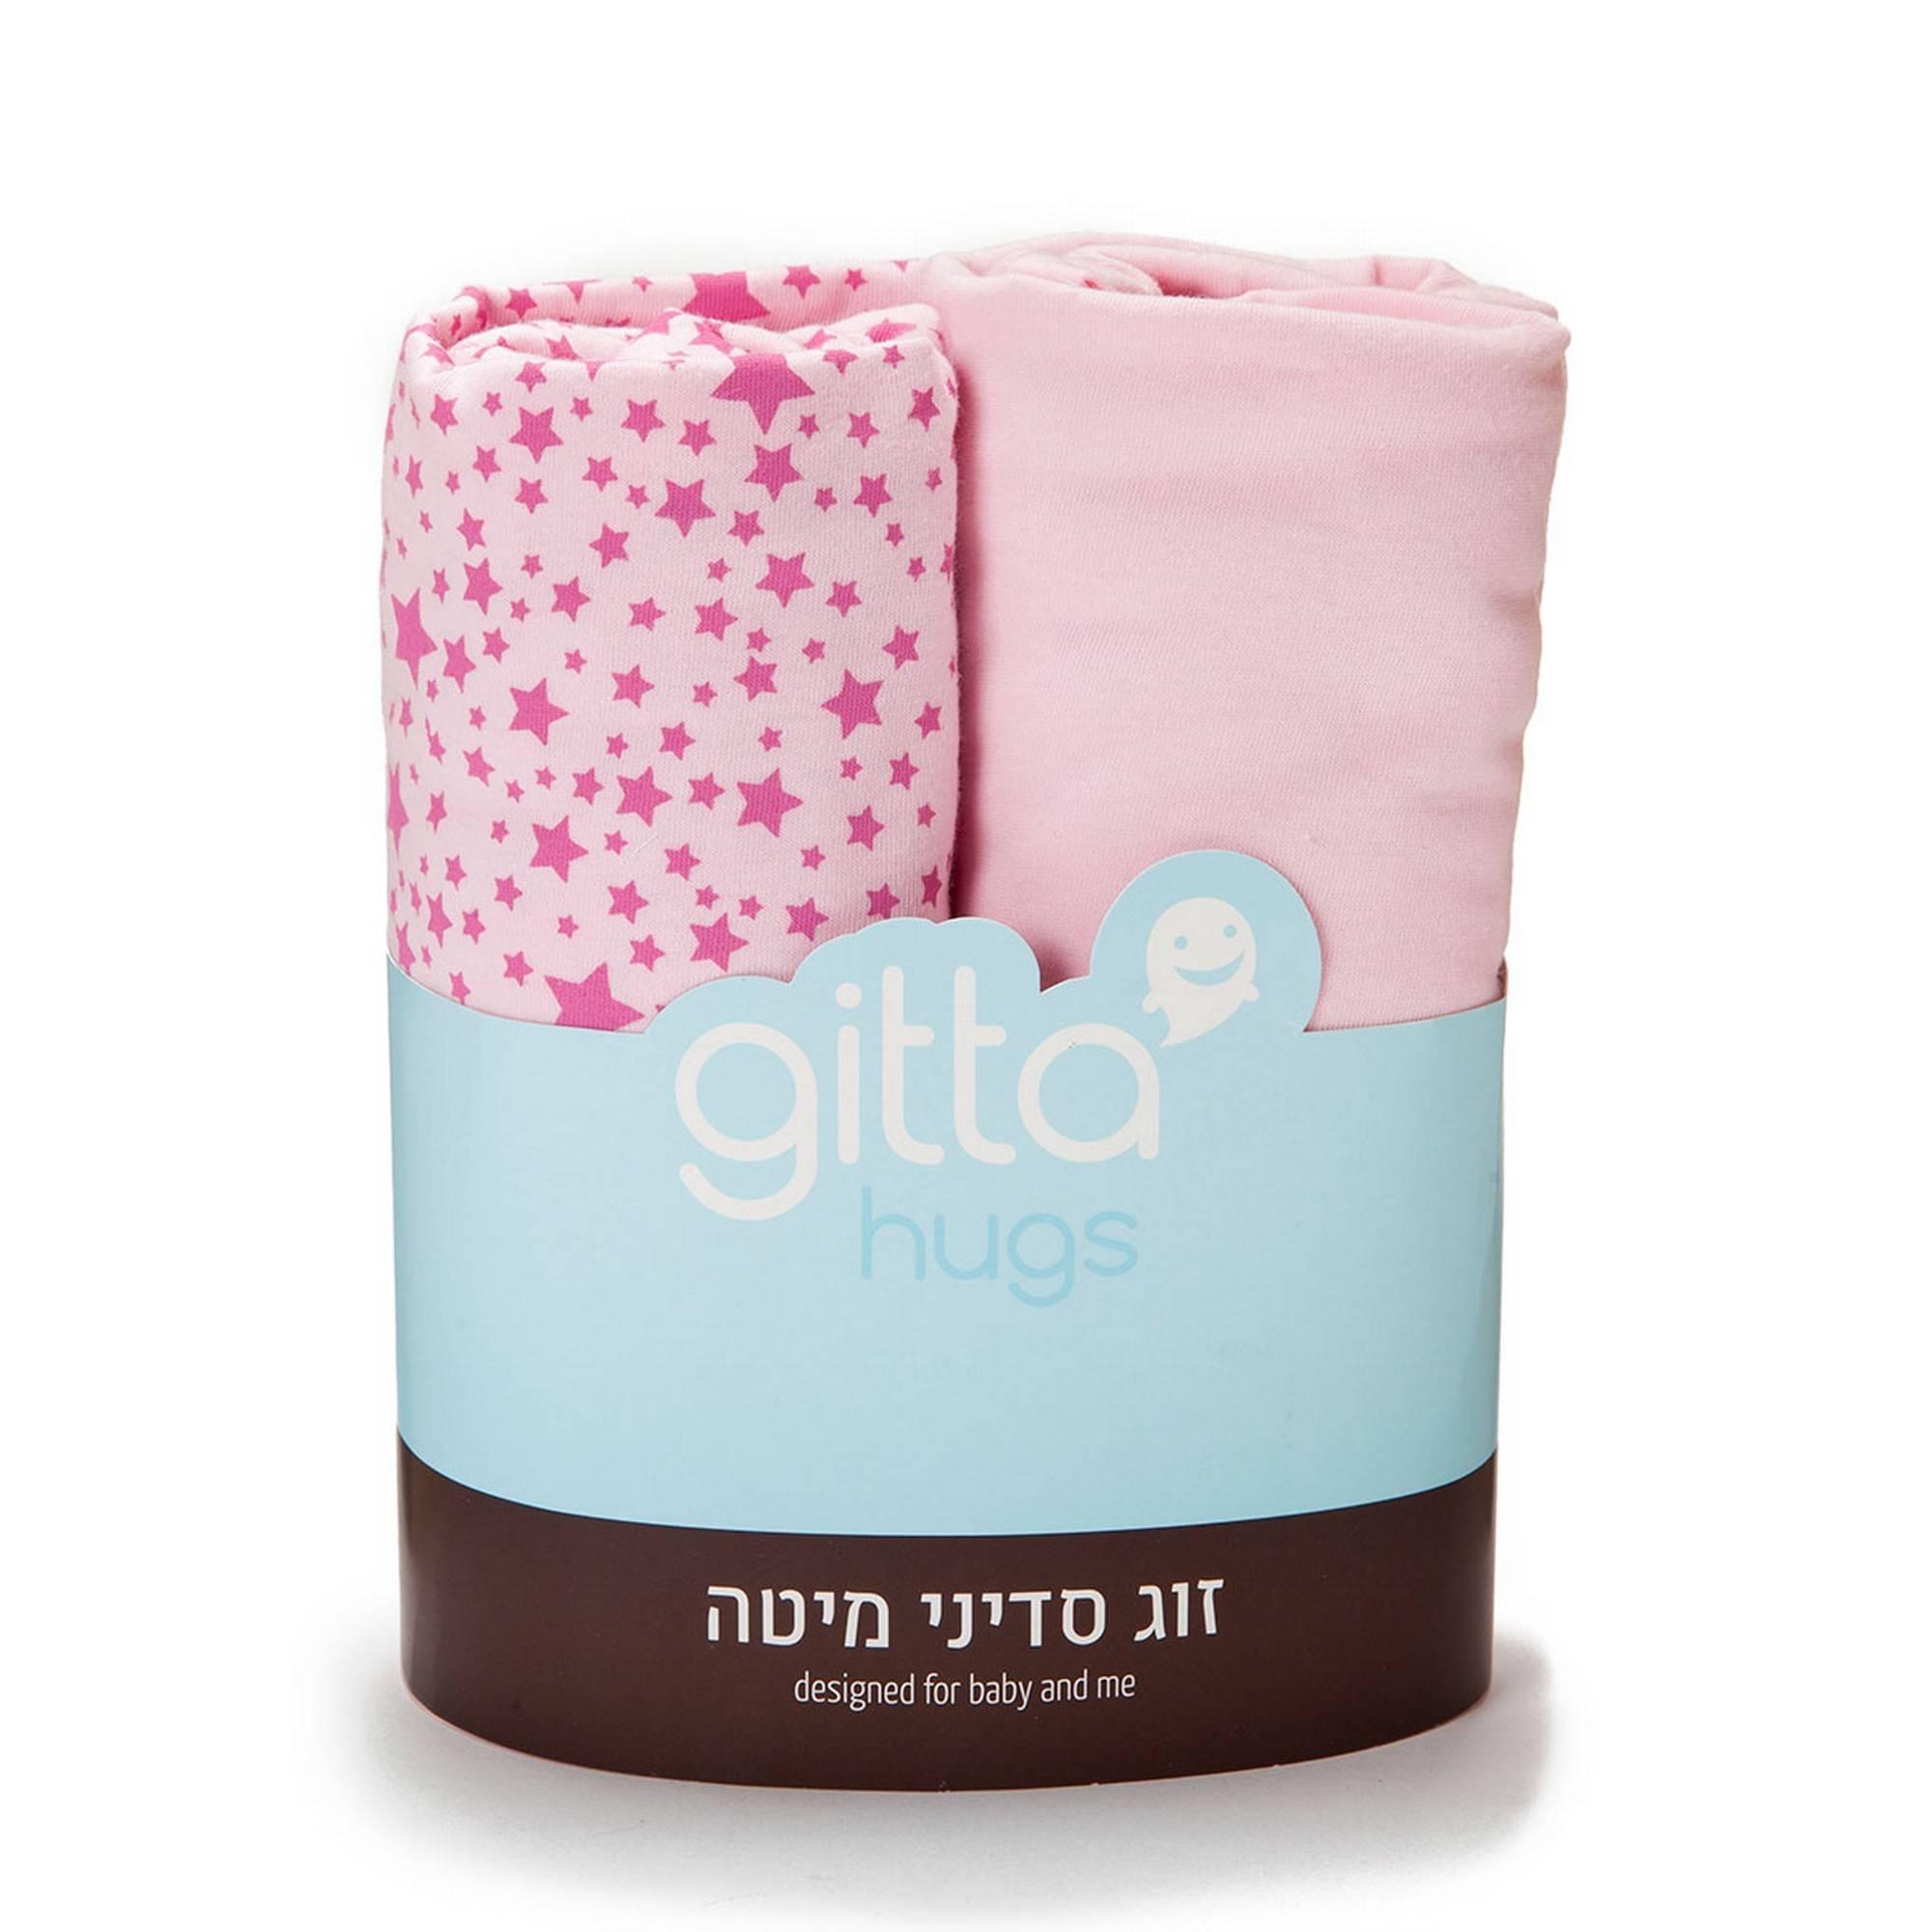 GITTA Cot Sheets - Pink Stars